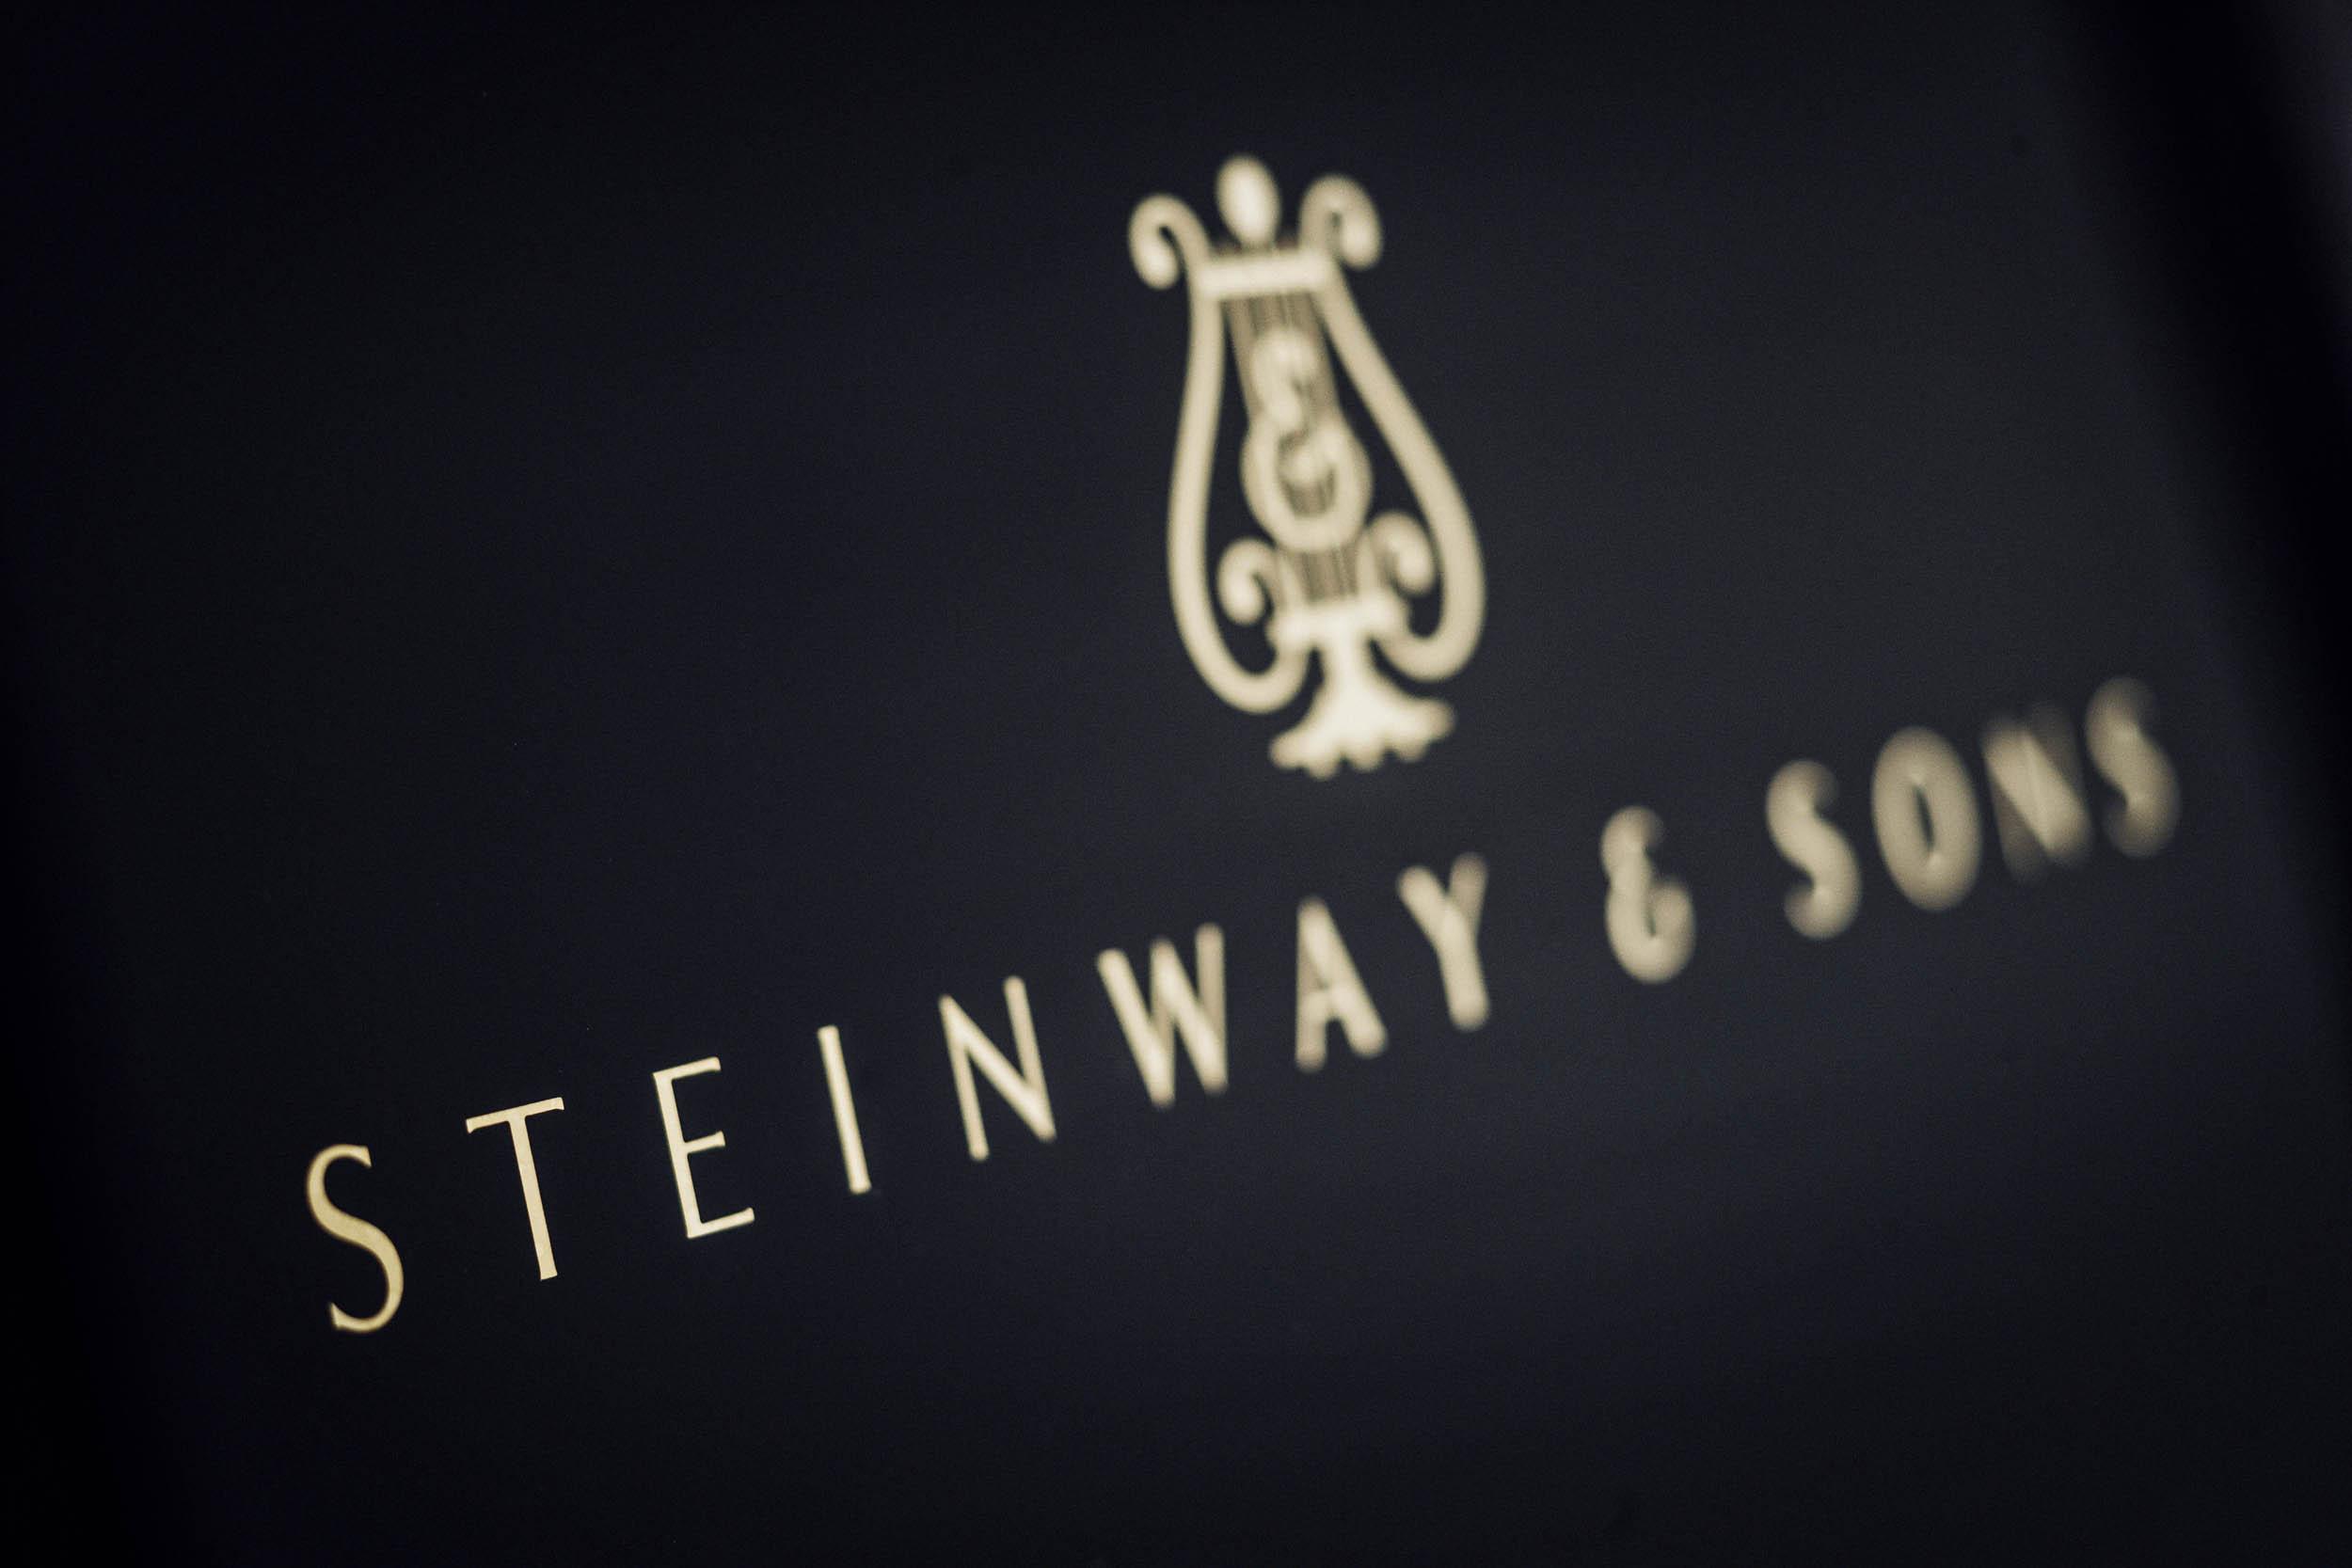 2019-SeifertUebler-steinway-piano-013.jpg